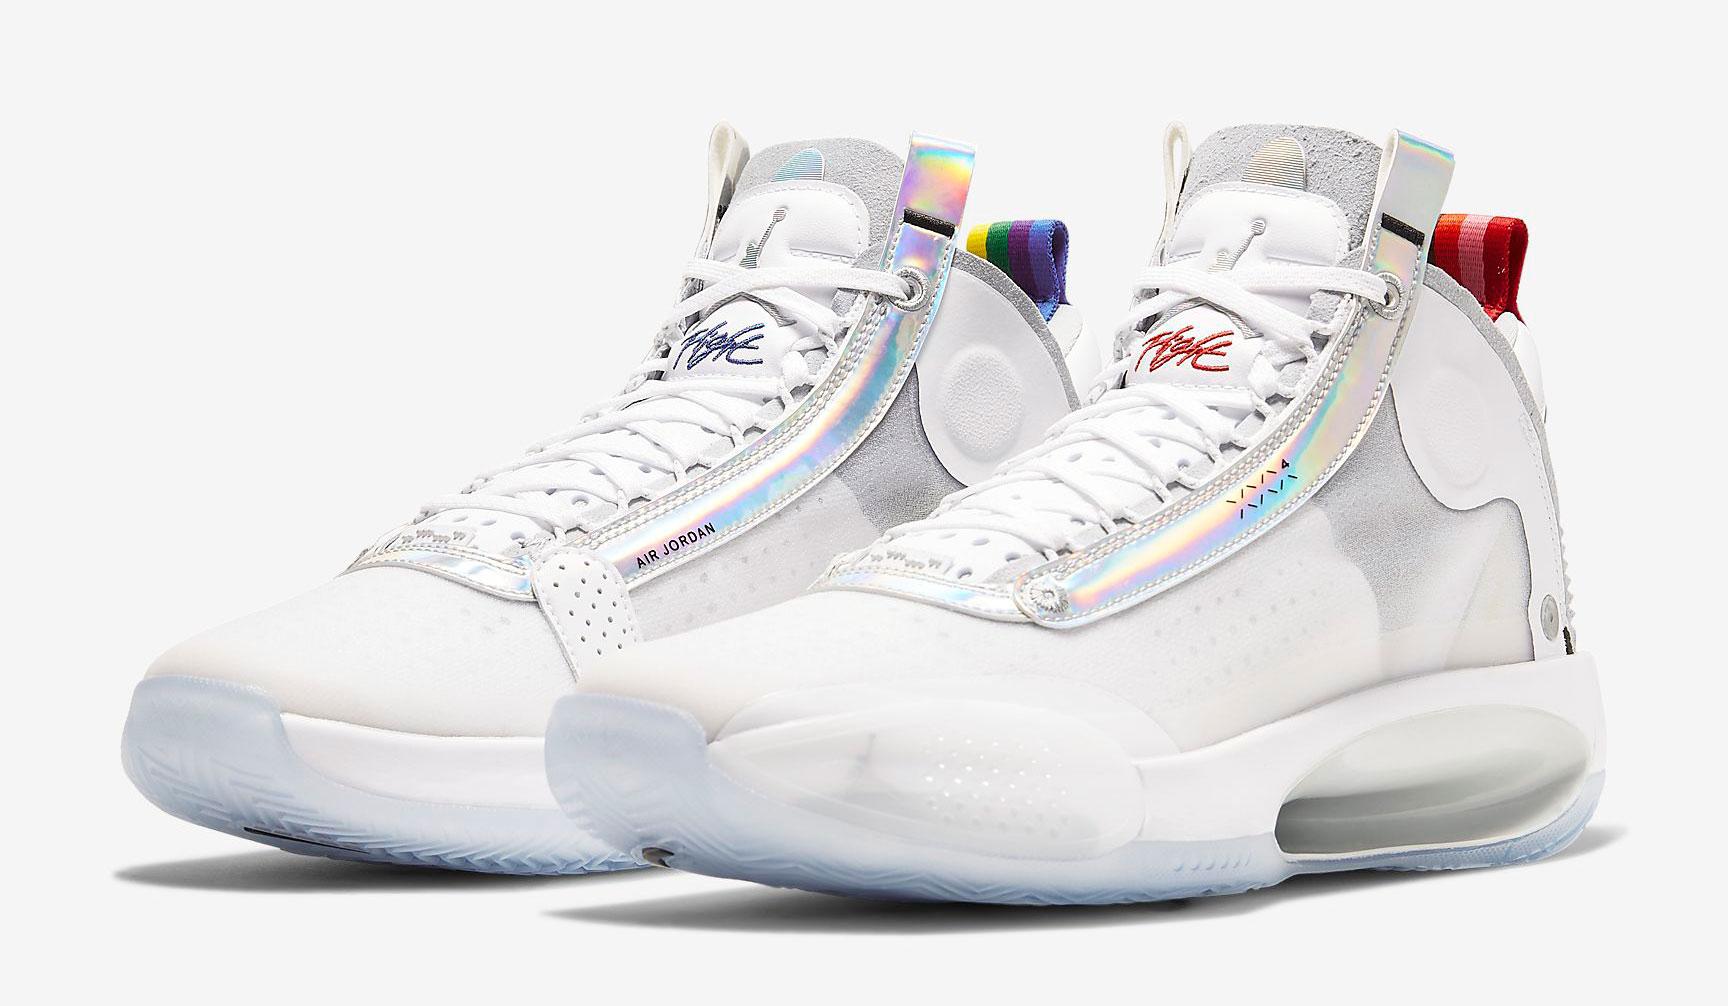 air-jordan-34-unite-white-silver-iridescent-release-date-1